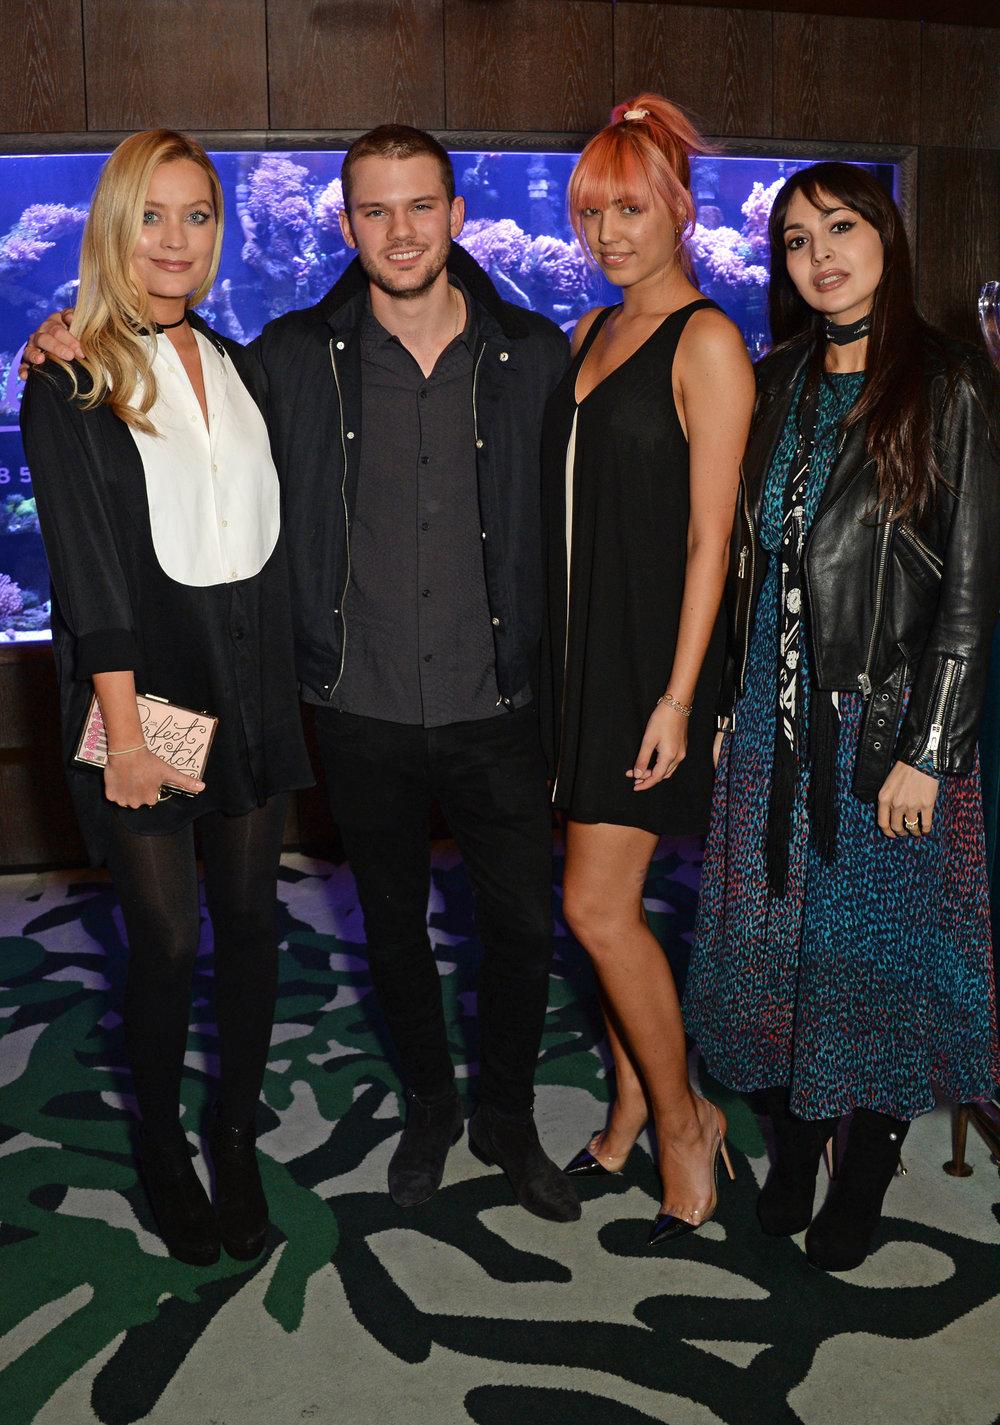 Laura Whitemore, Jeremy Irvine, Amber Le Bon & Zara Martin